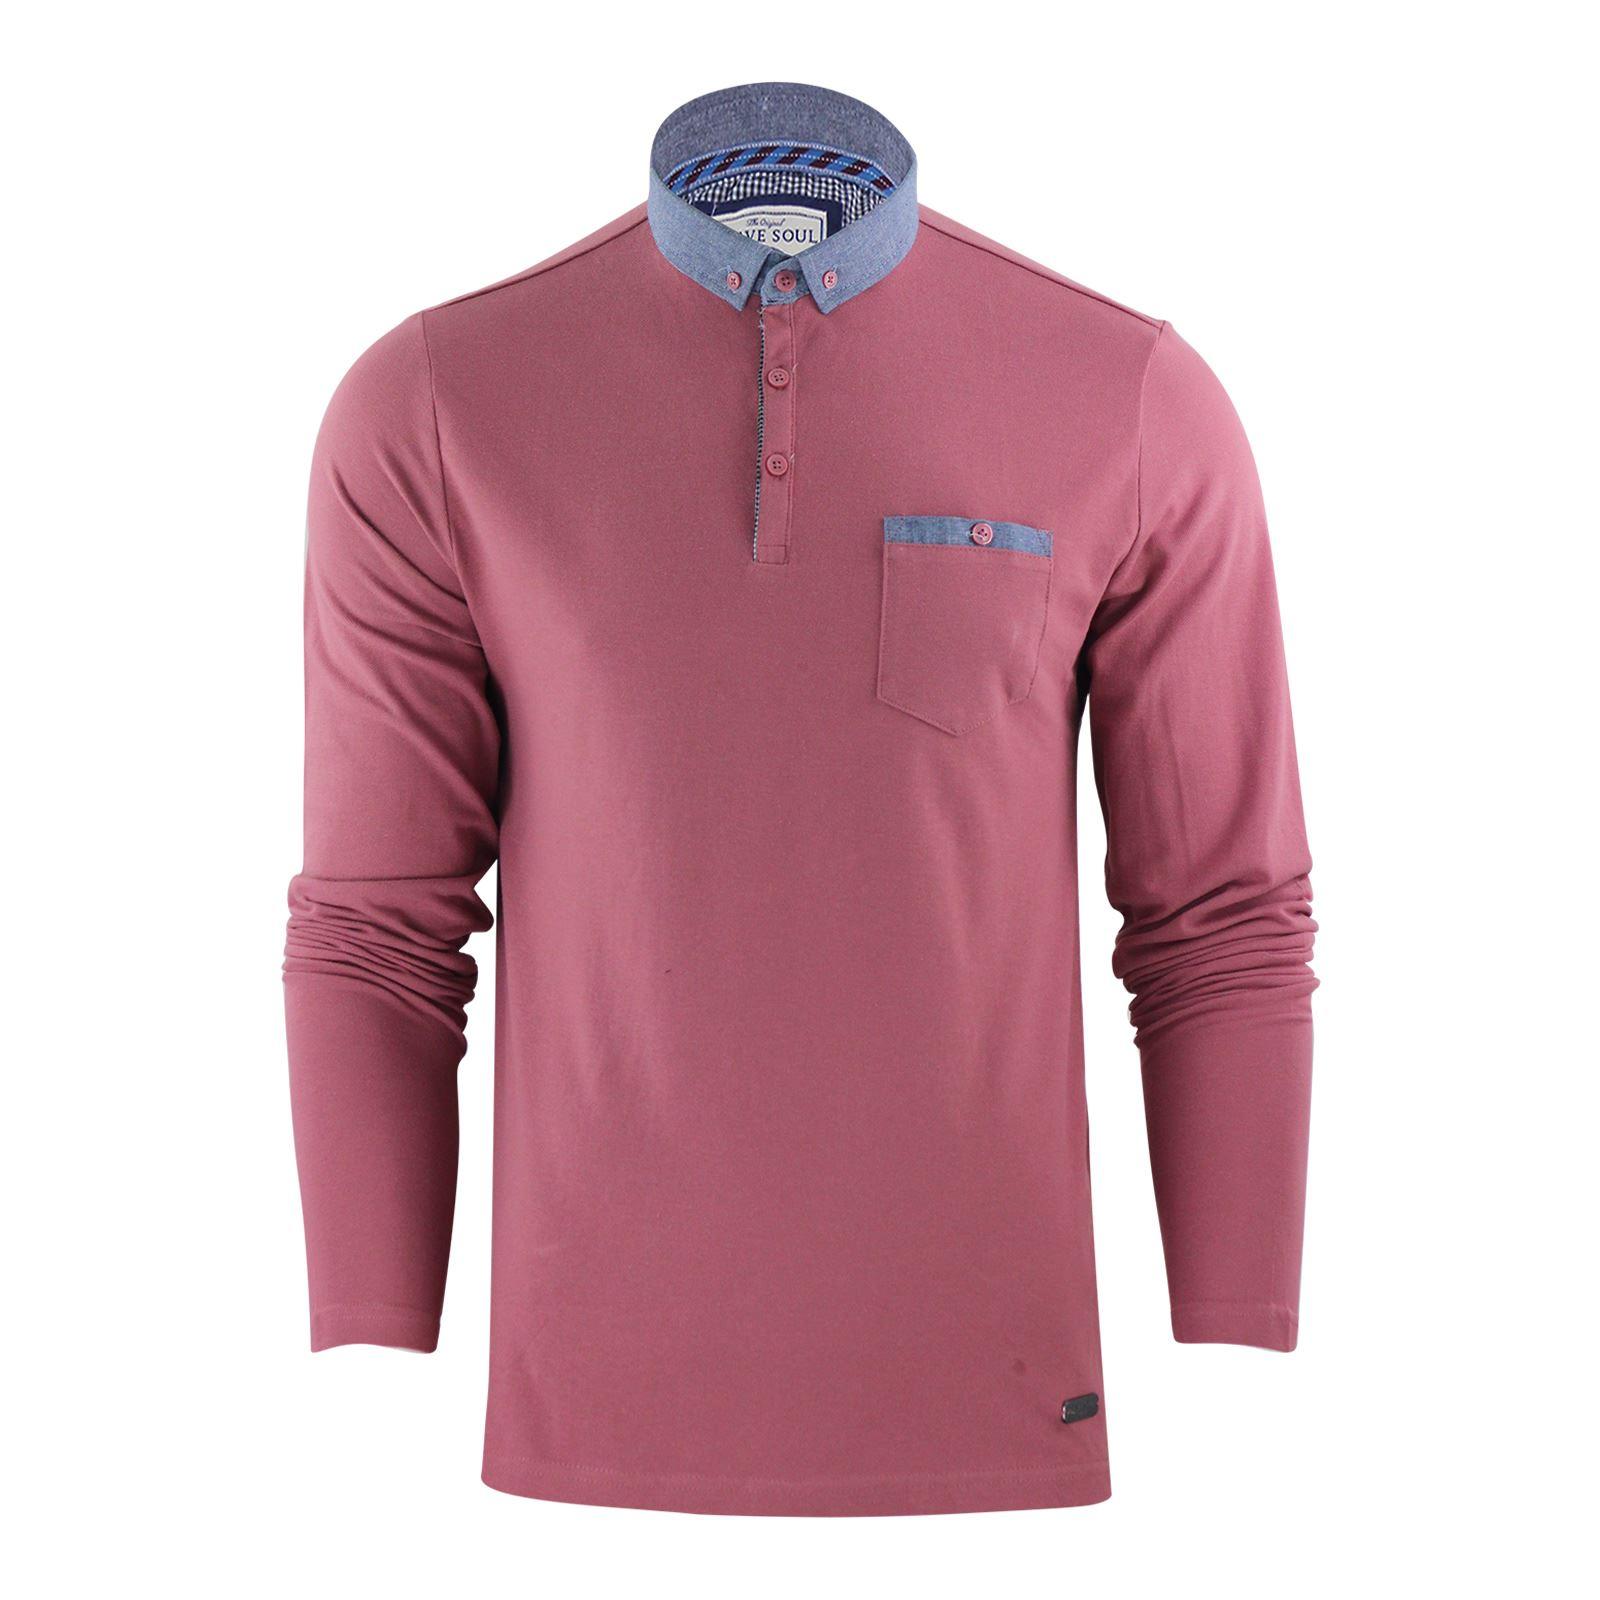 Para-Hombre-Polo-T-Shirt-Alma-valiente-Hera-Manga-Larga-De-Algodon-Casual-Top miniatura 17